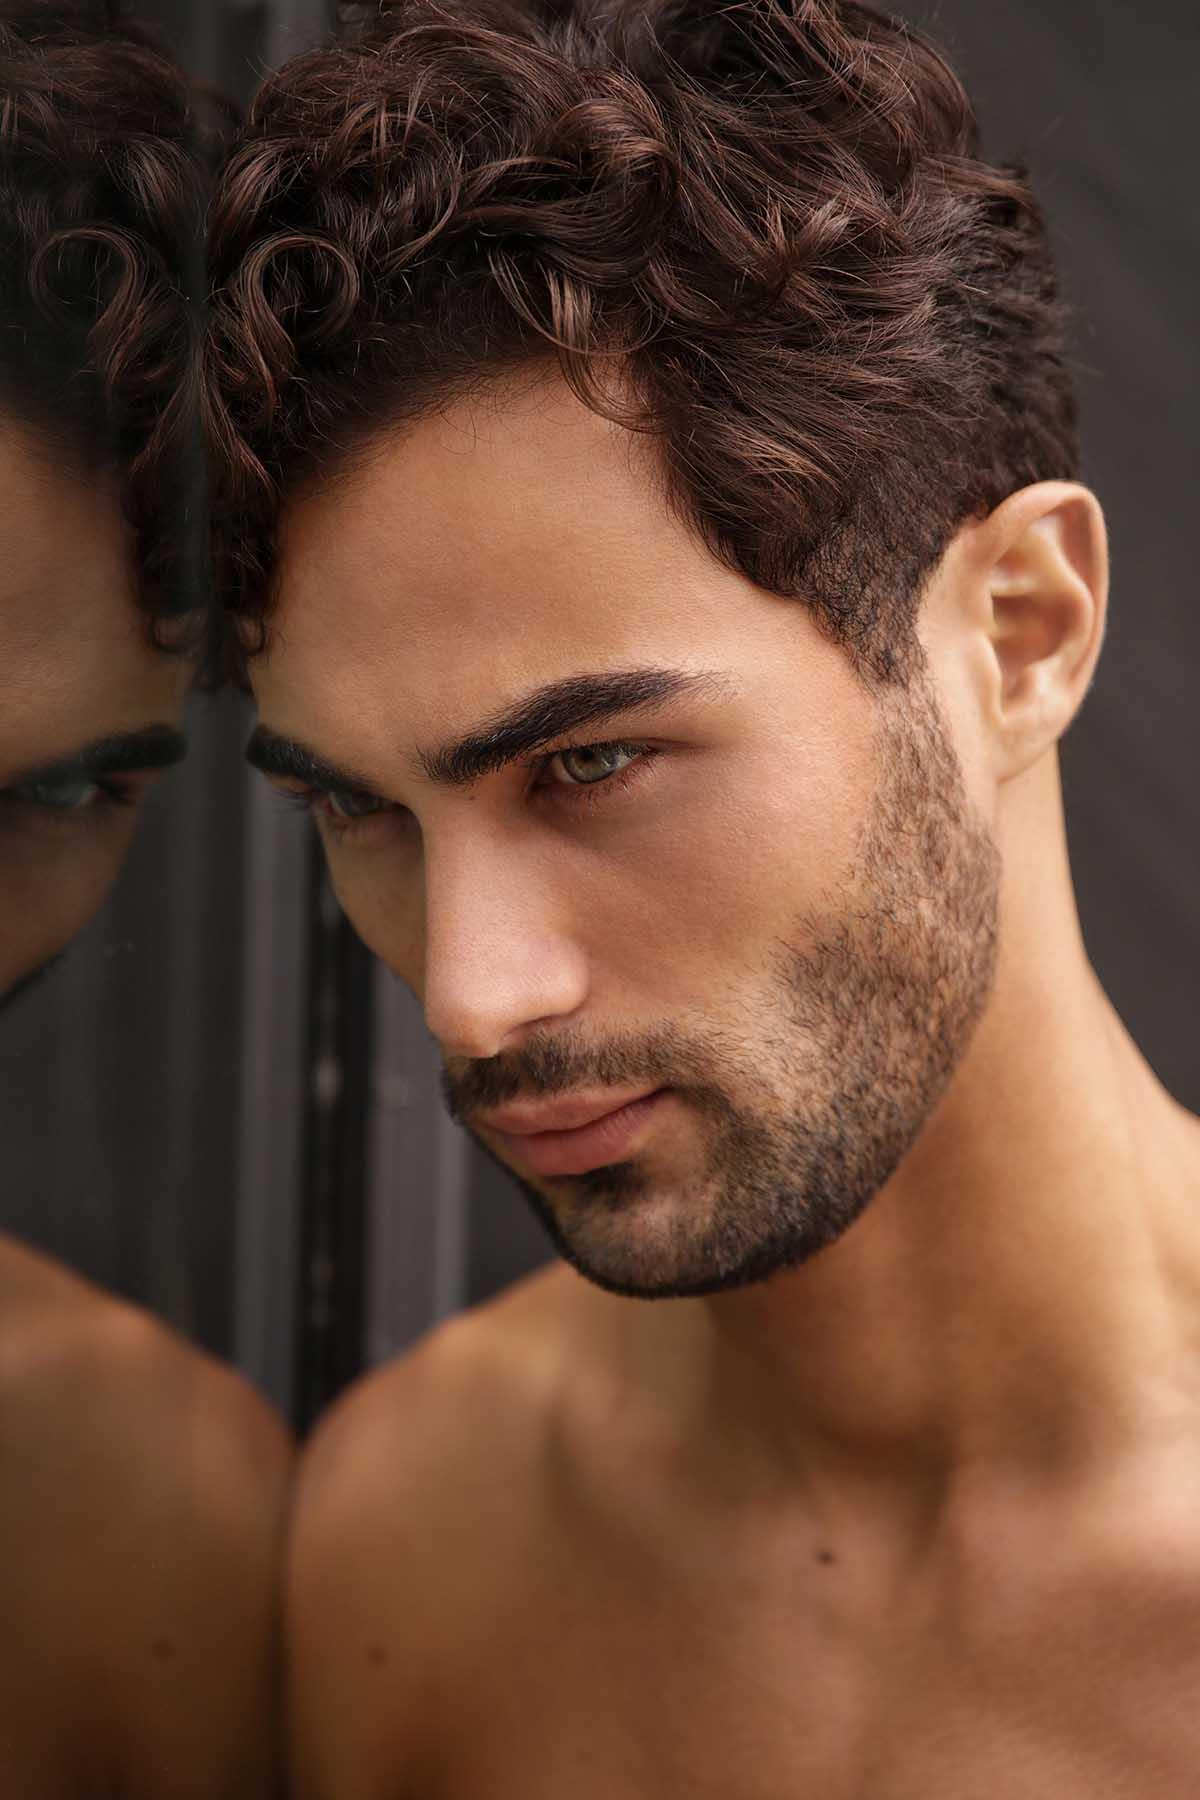 Lucas Alves by Habib Caiado for Brazilian Male Model